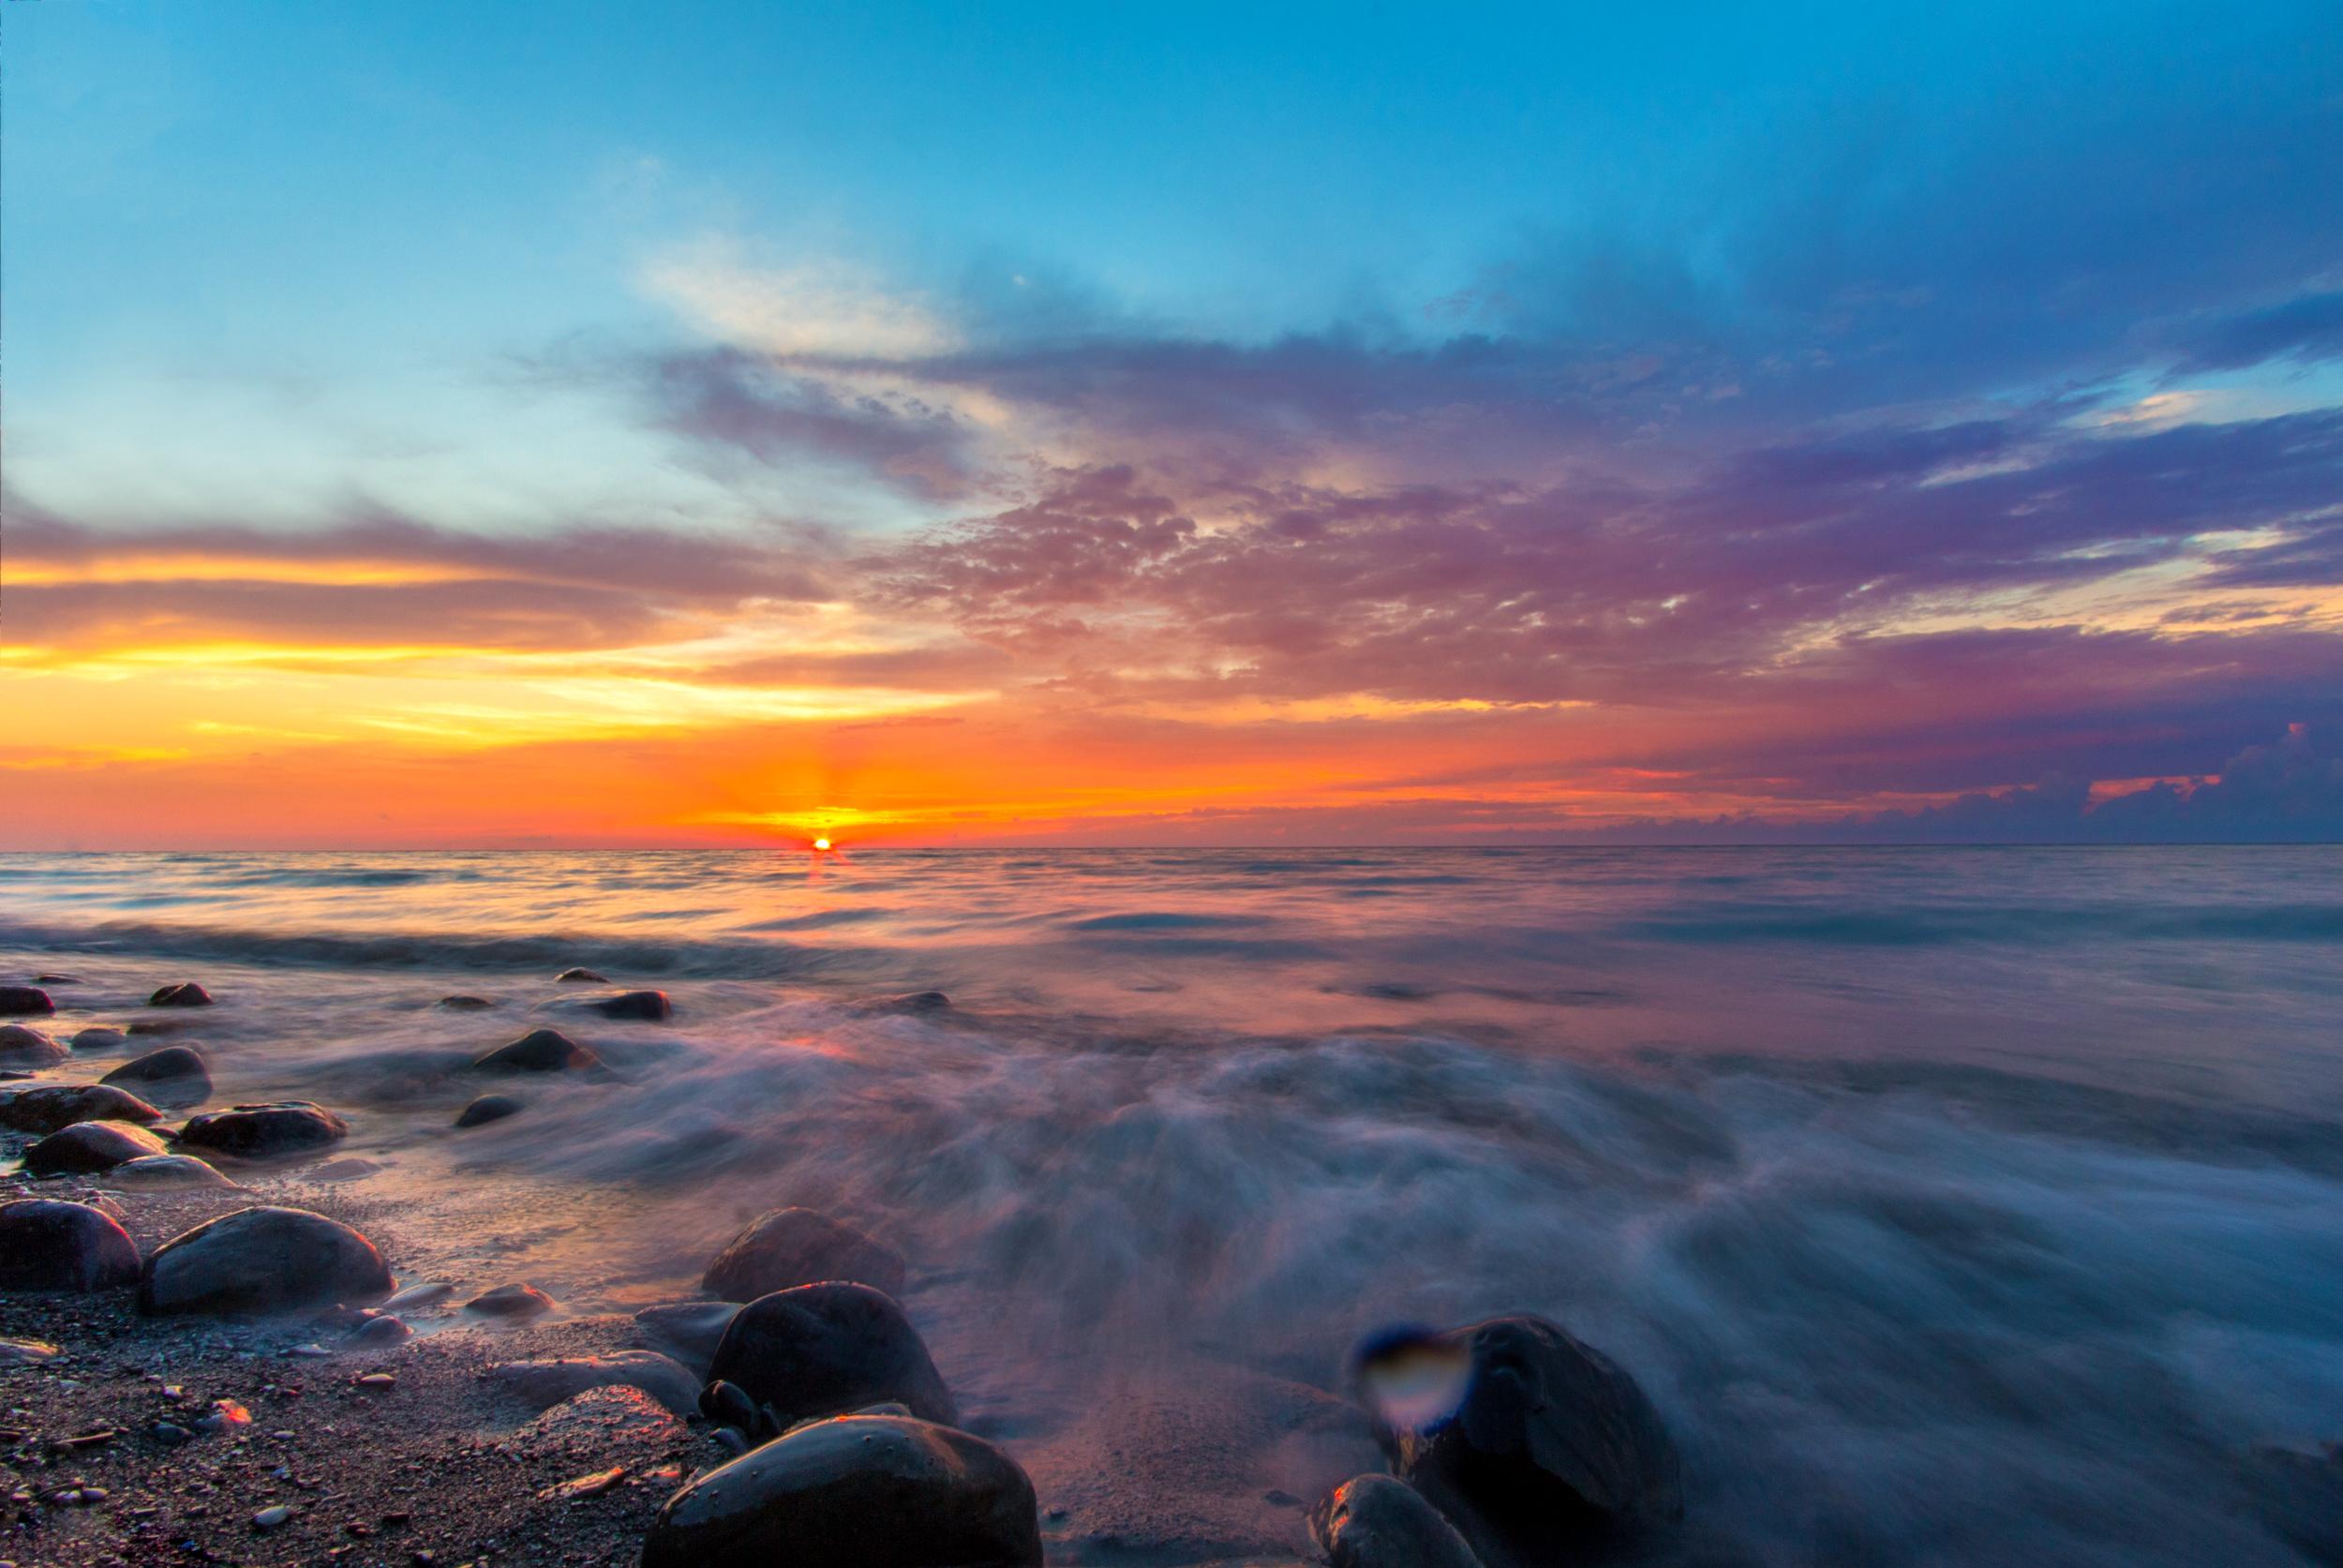 LakeErieBluffs-Sunset081716-3.jpg